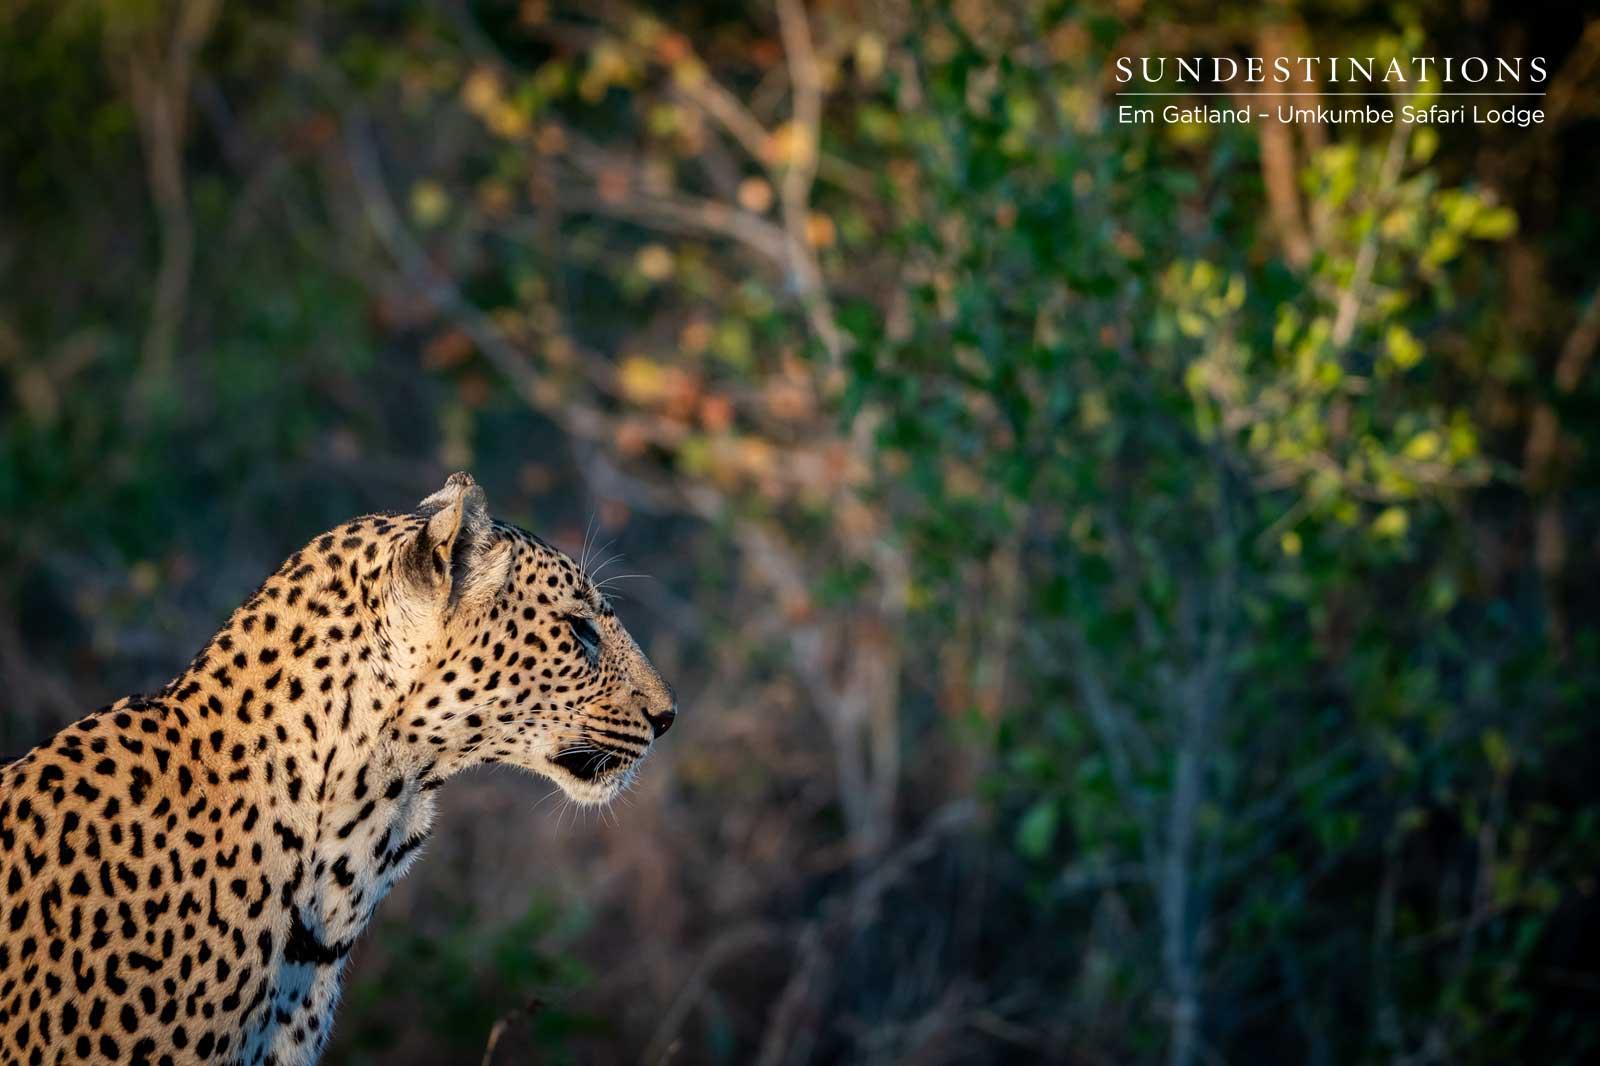 Leopards at Umkumbe Safari Lodge